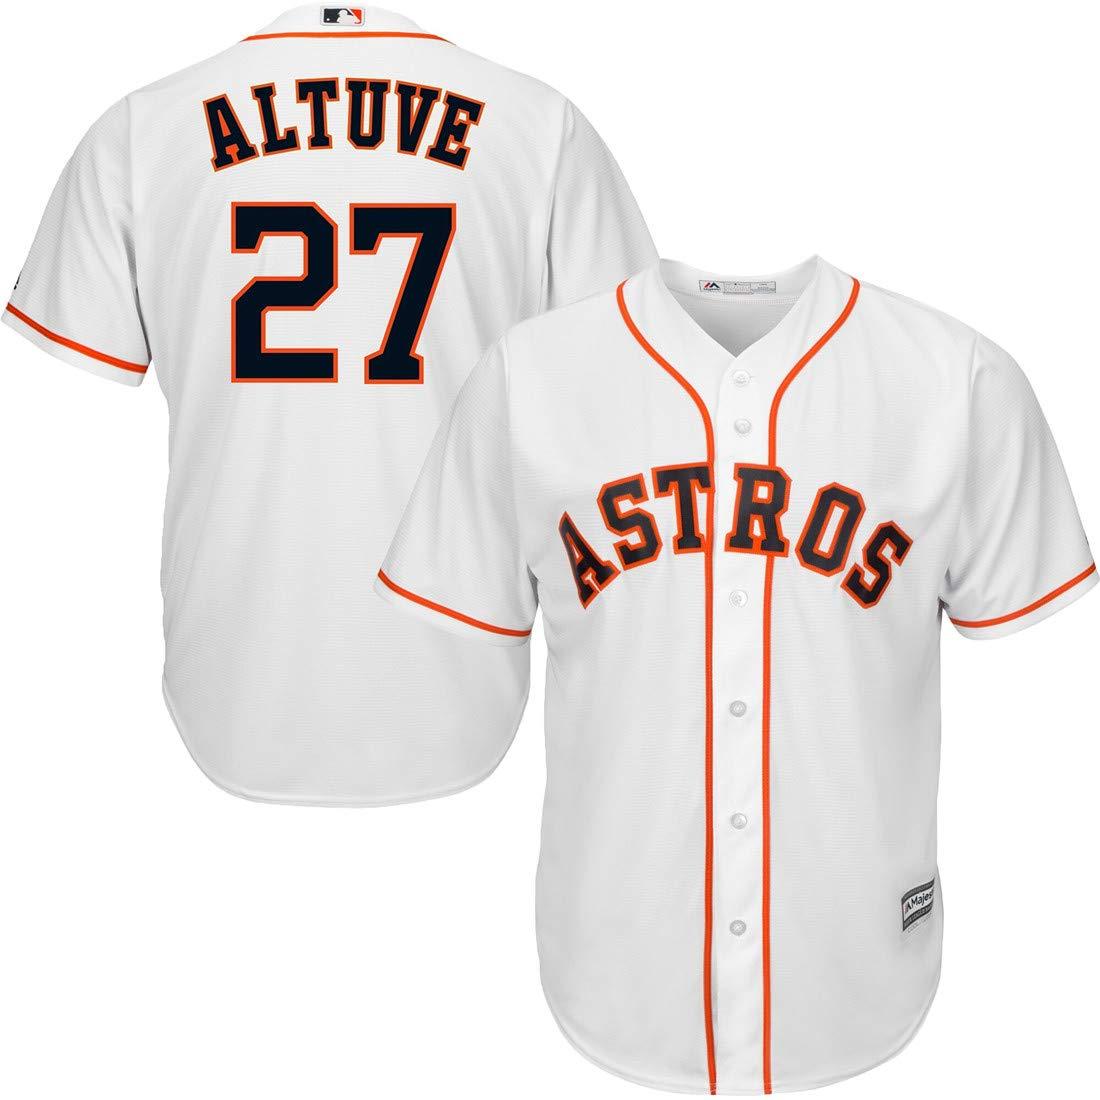 new york 9177c 1da9c Outerstuff Youth Kids 27 Jose Altuve Houston Astros Baseball Jersey